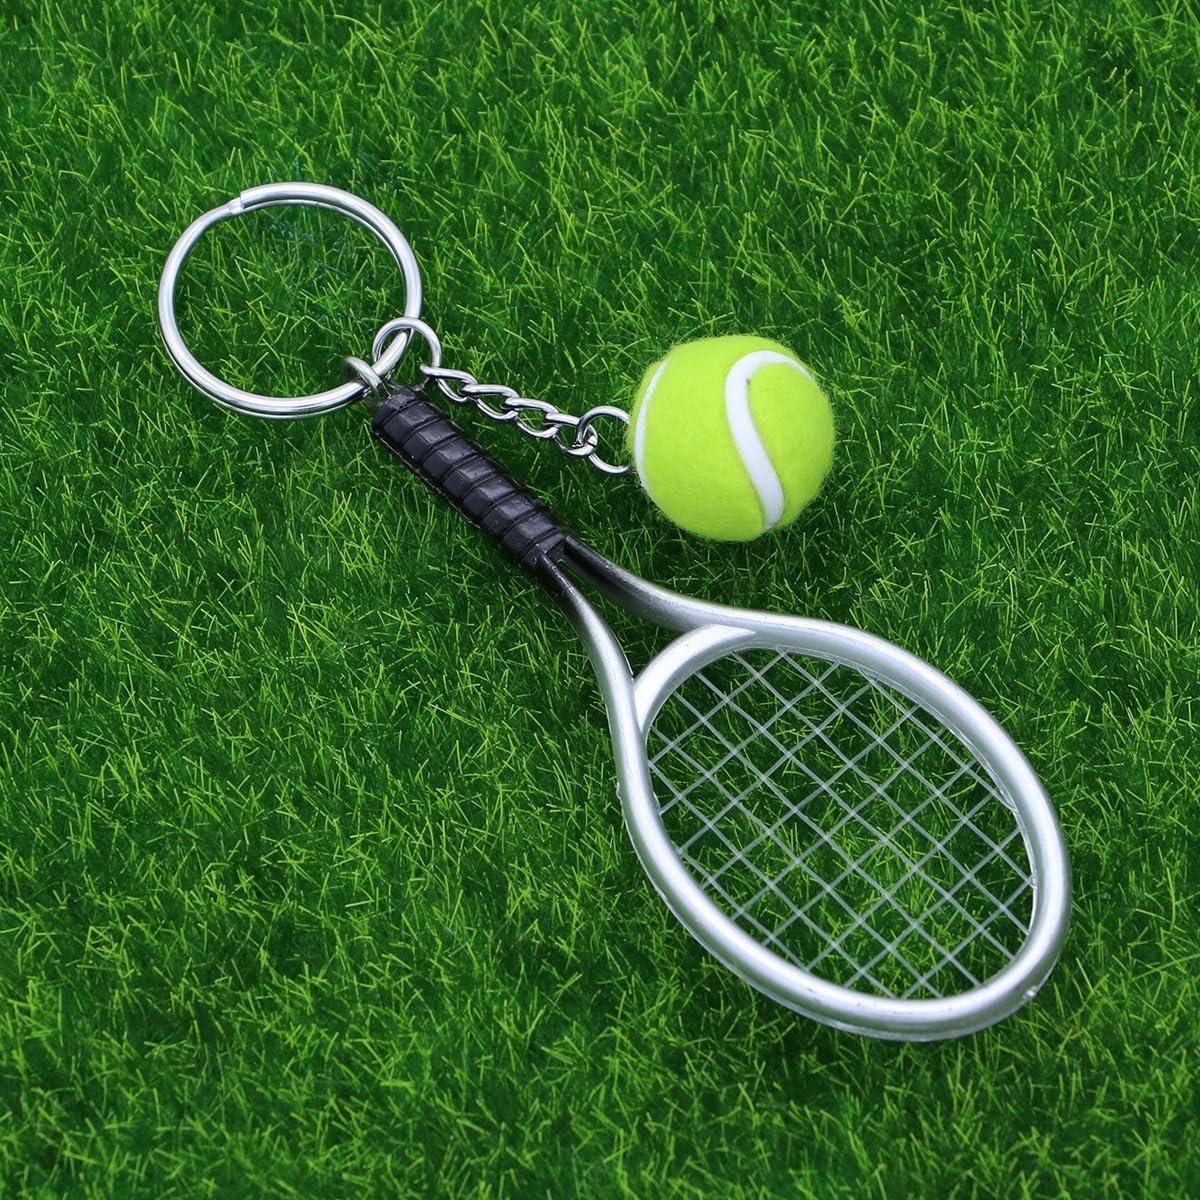 VOSAREA Schl/üsselanh/änger Sport Schl/üsselanh/änger Tennis Ball Schl/üsselanh/änger Keychain